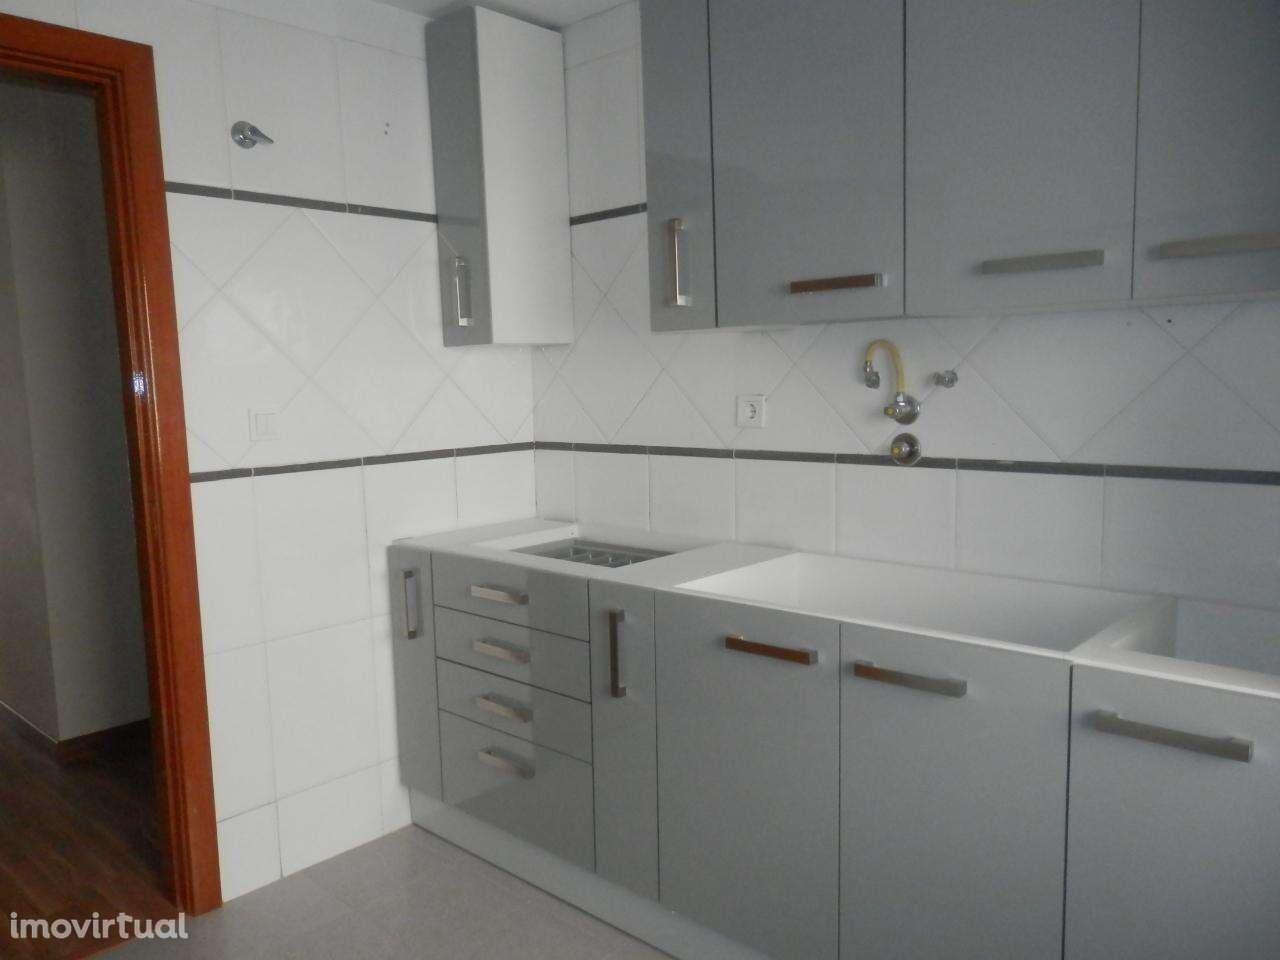 Apartamento para comprar, Rio de Mouro, Sintra, Lisboa - Foto 1